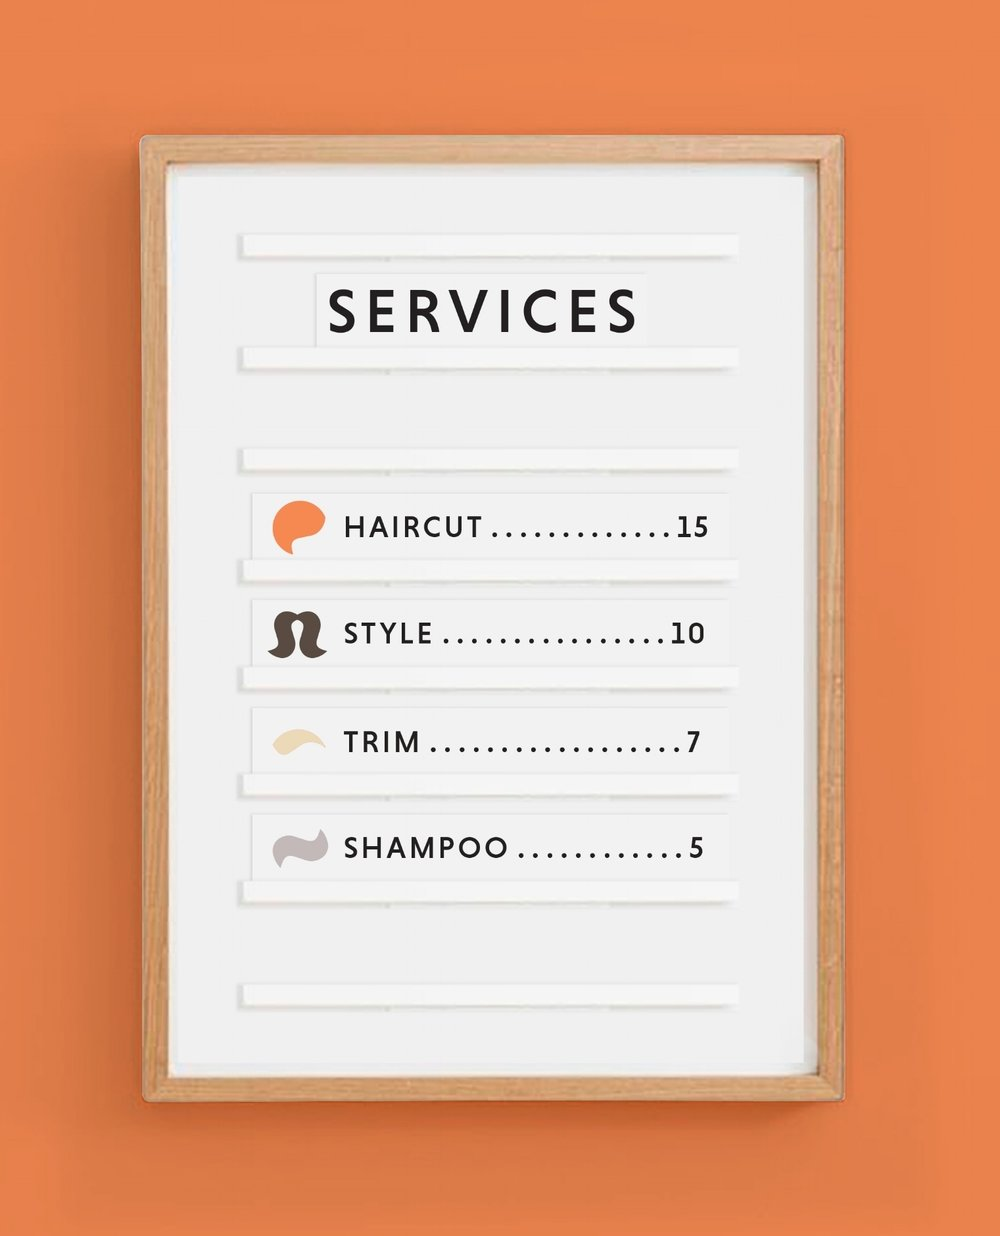 Tina_Roach_GC_Services.jpg